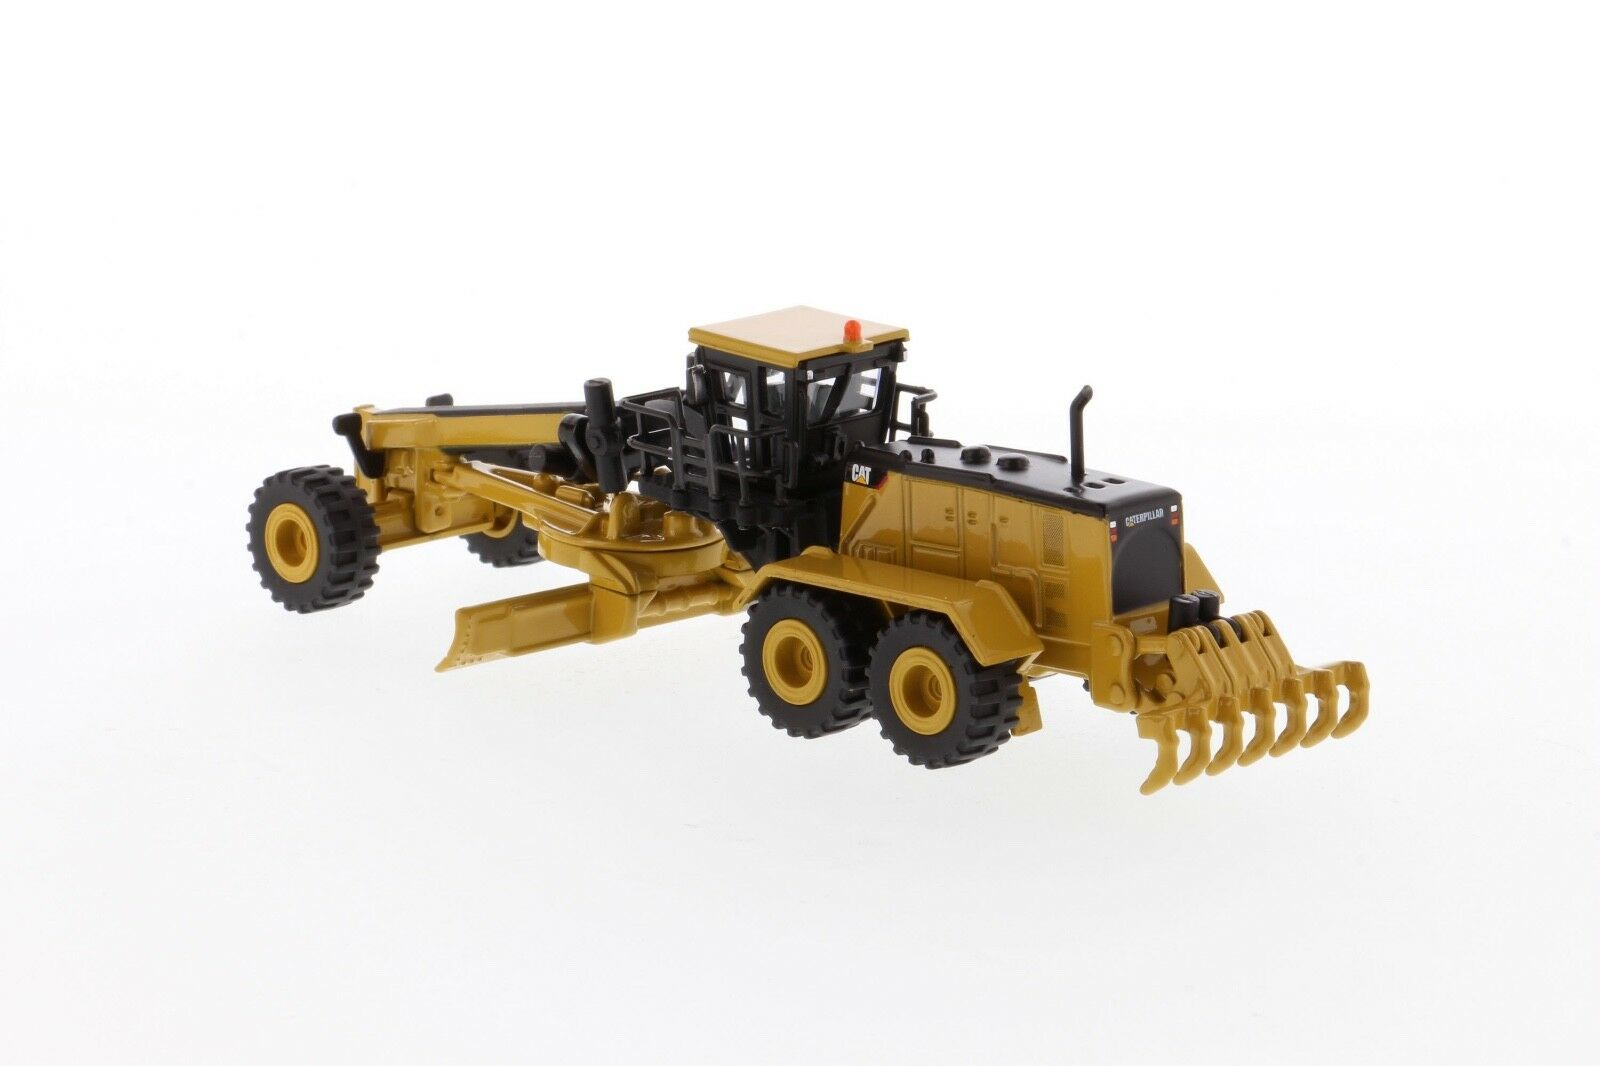 Cat Caterpillar Caterpillar Caterpillar 1 125 scale 24M Motor Grader Diecast Masters 85539 Elite Series 882e07